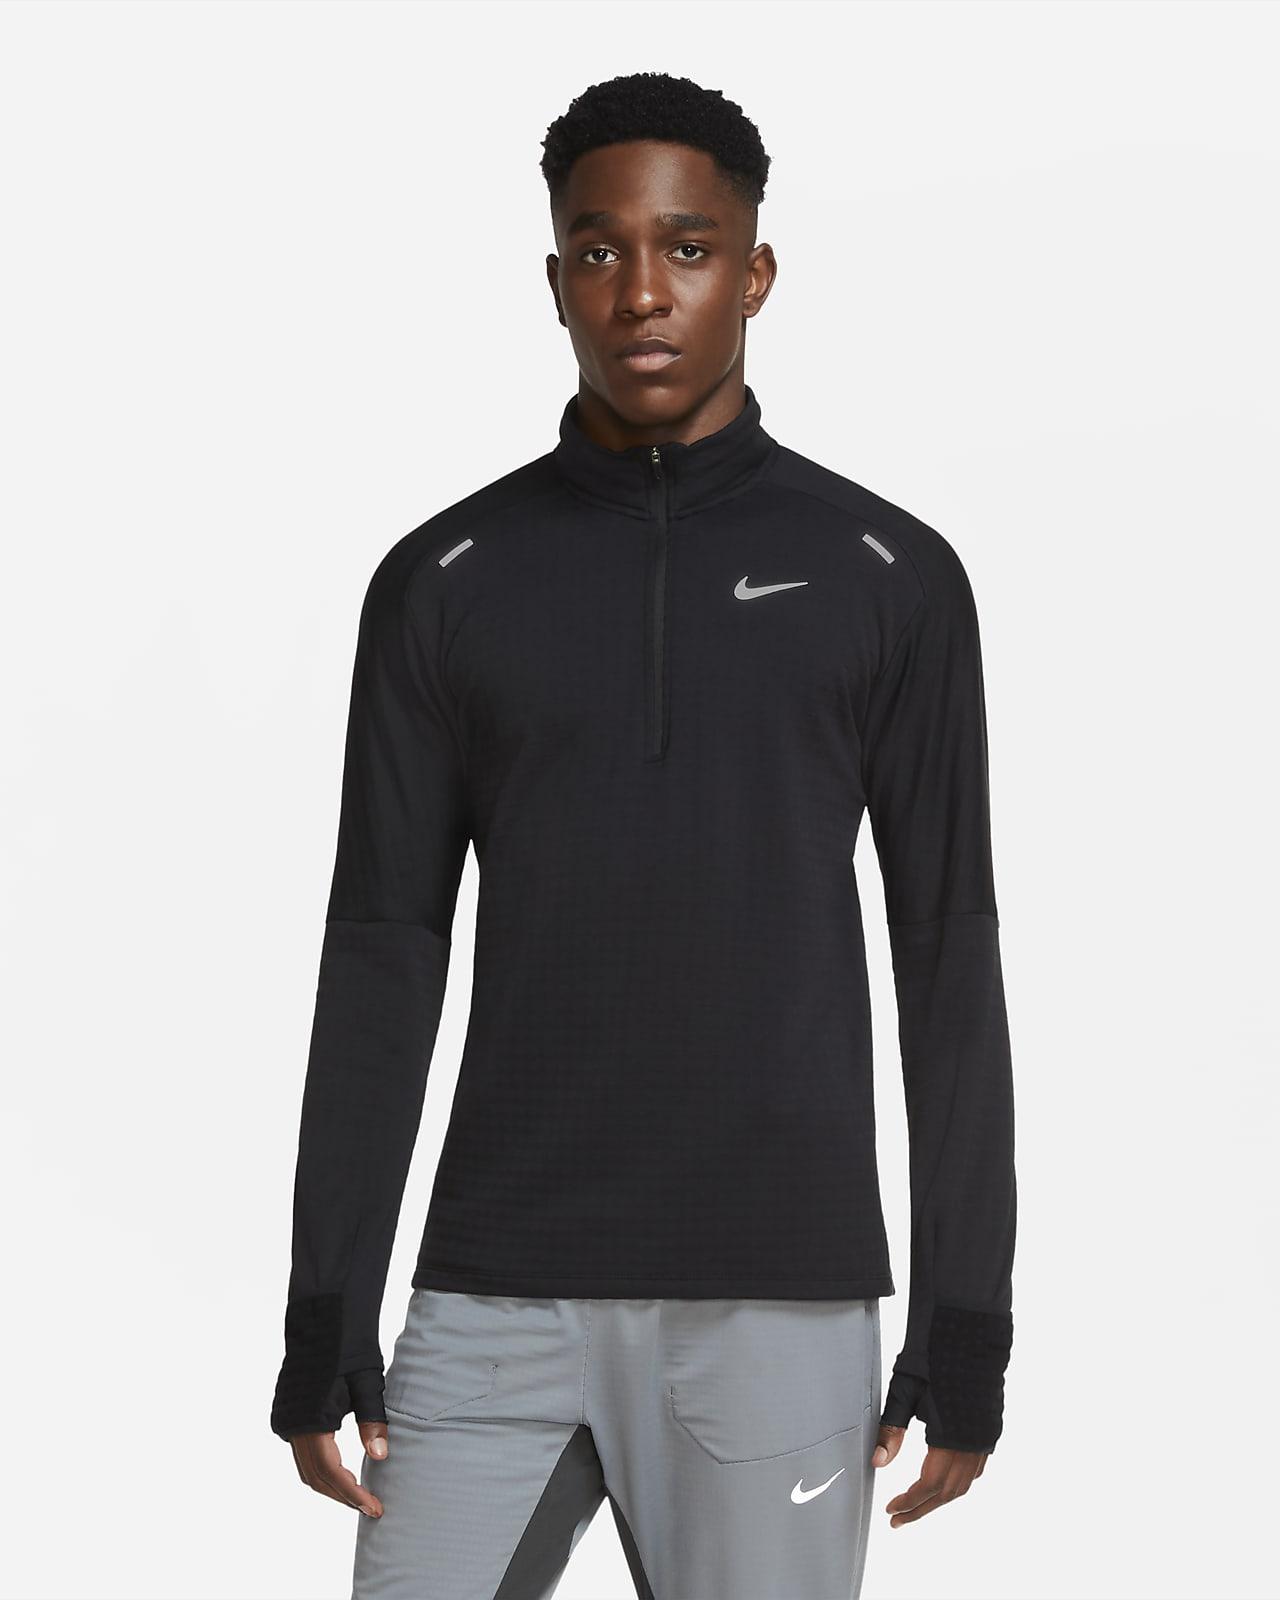 Nike Sphere Camiseta de running con media cremallera - Hombre